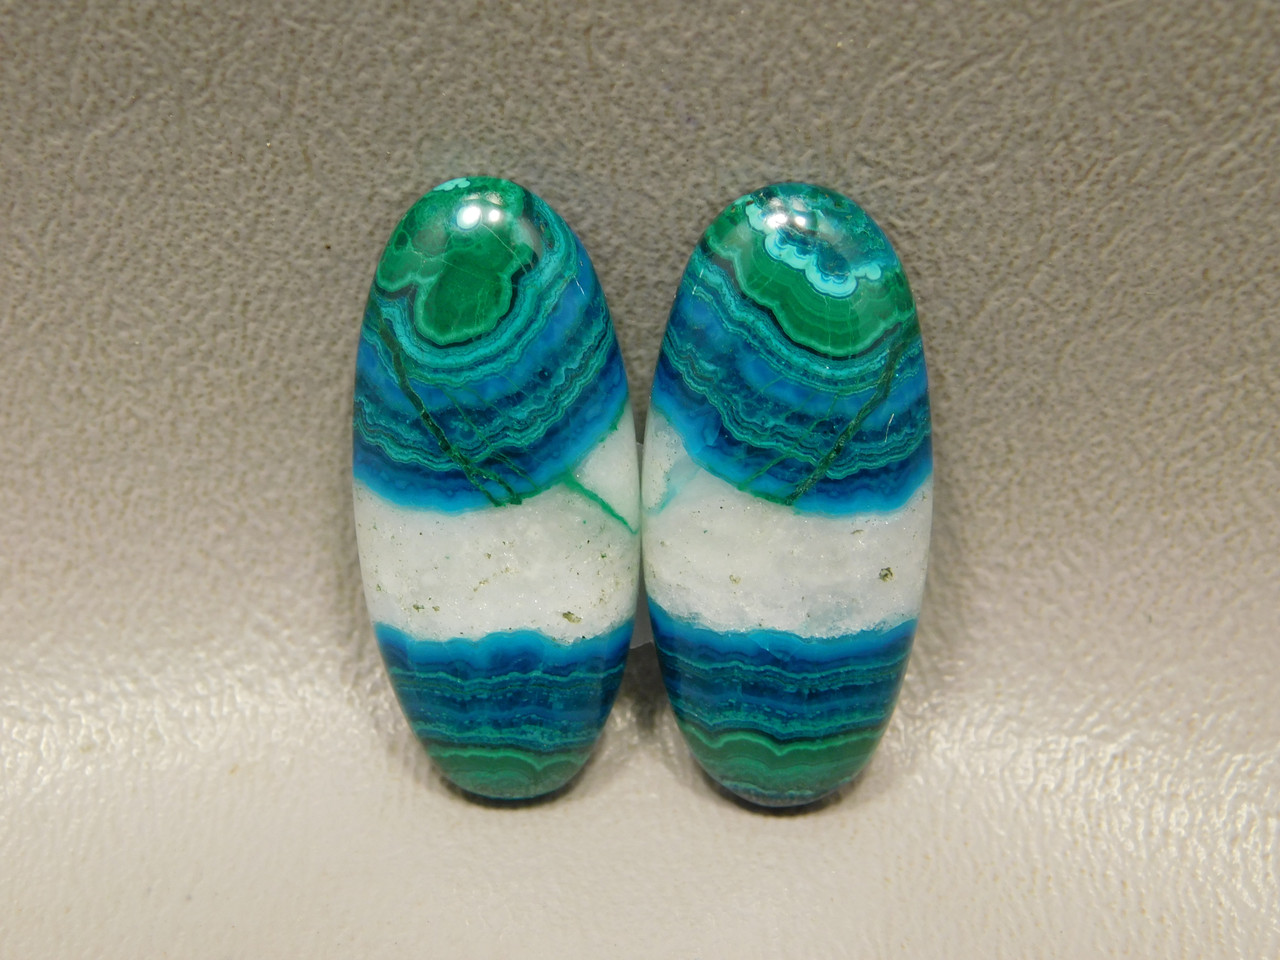 Chrysocolla Malachite Large Ovals Cabochons Blue Green White #7